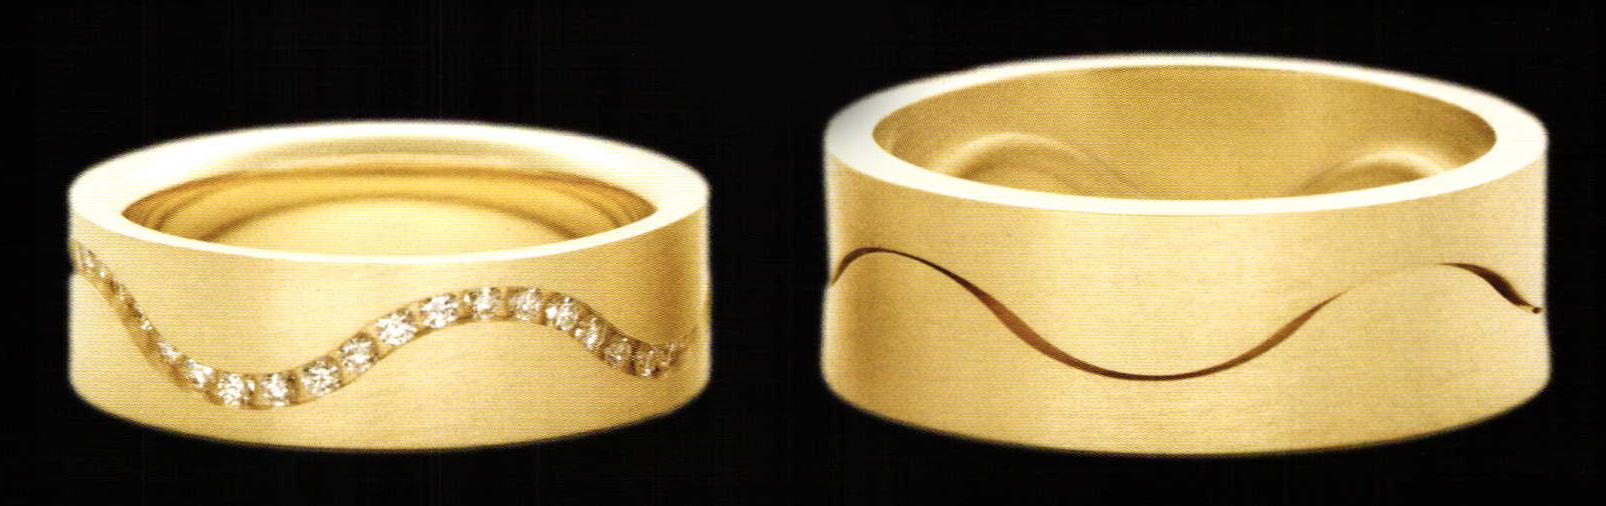 Marriage Rites The Ring As A Symbol Of Eternal Faithfulness Ganoksin